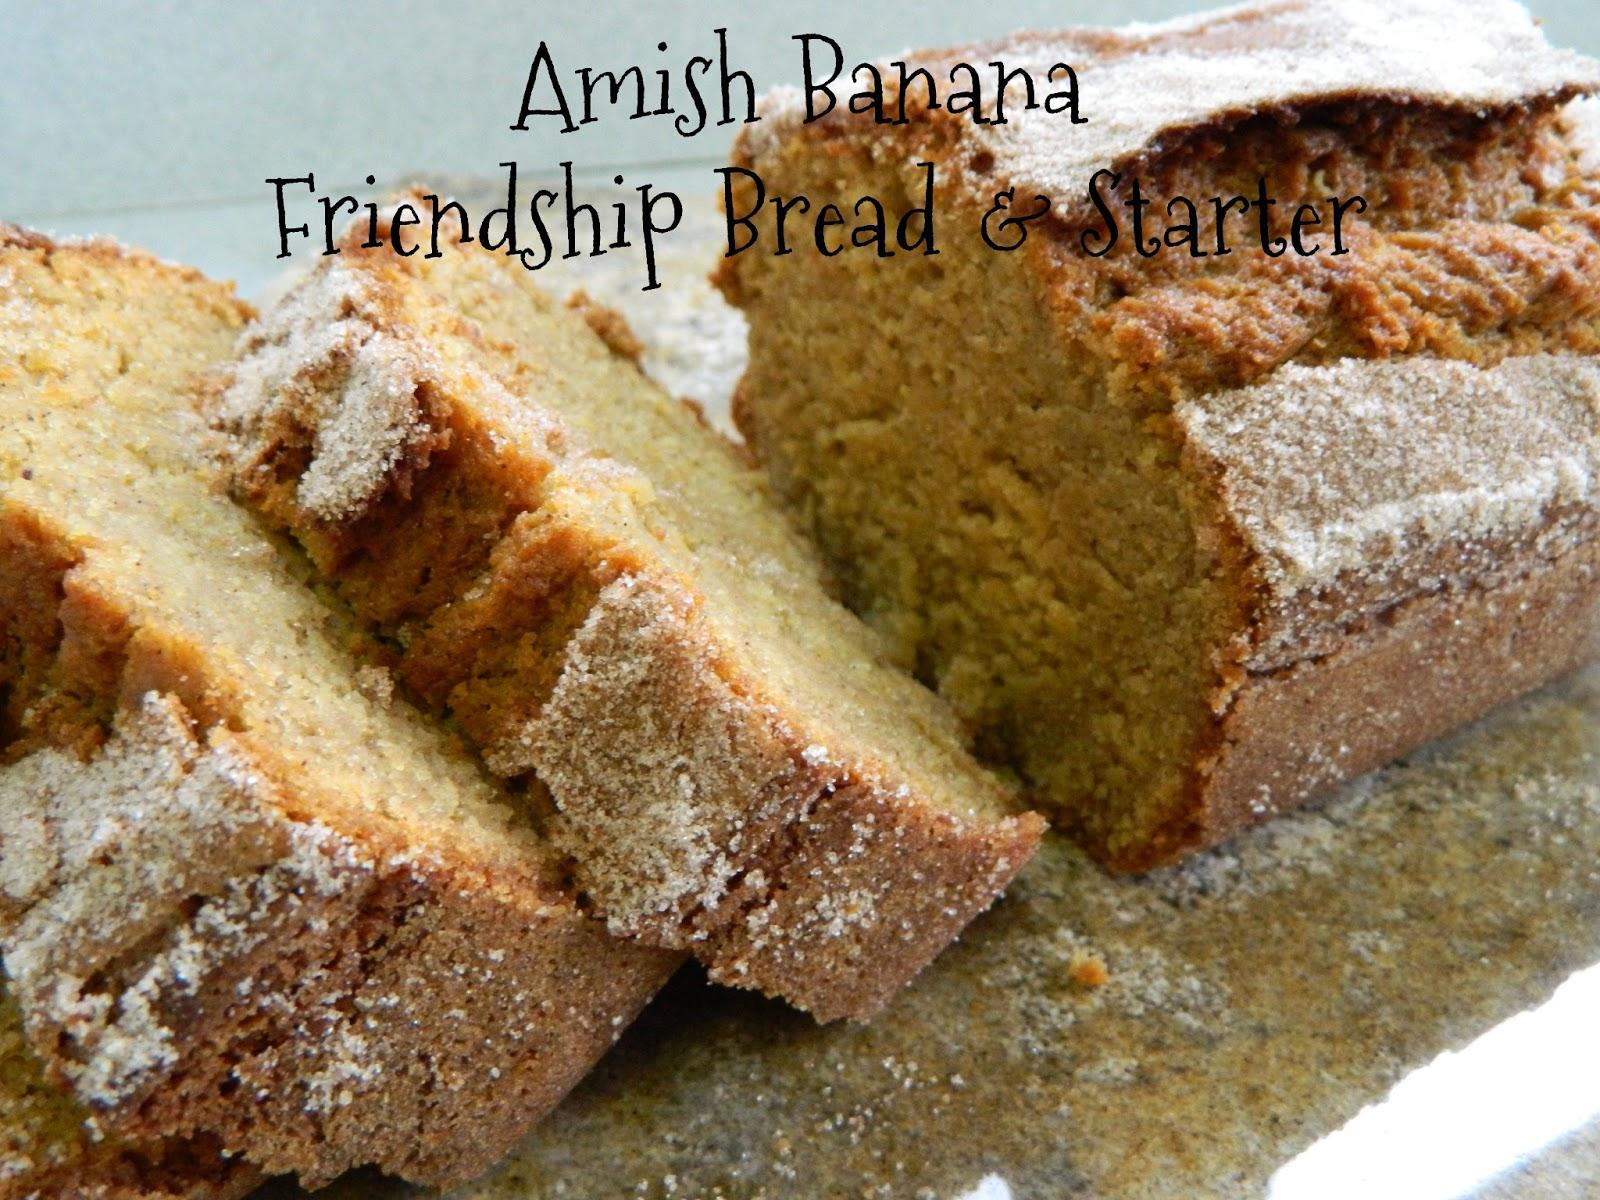 My Favorite Things: Amish Banana Friendship Bread & Starter